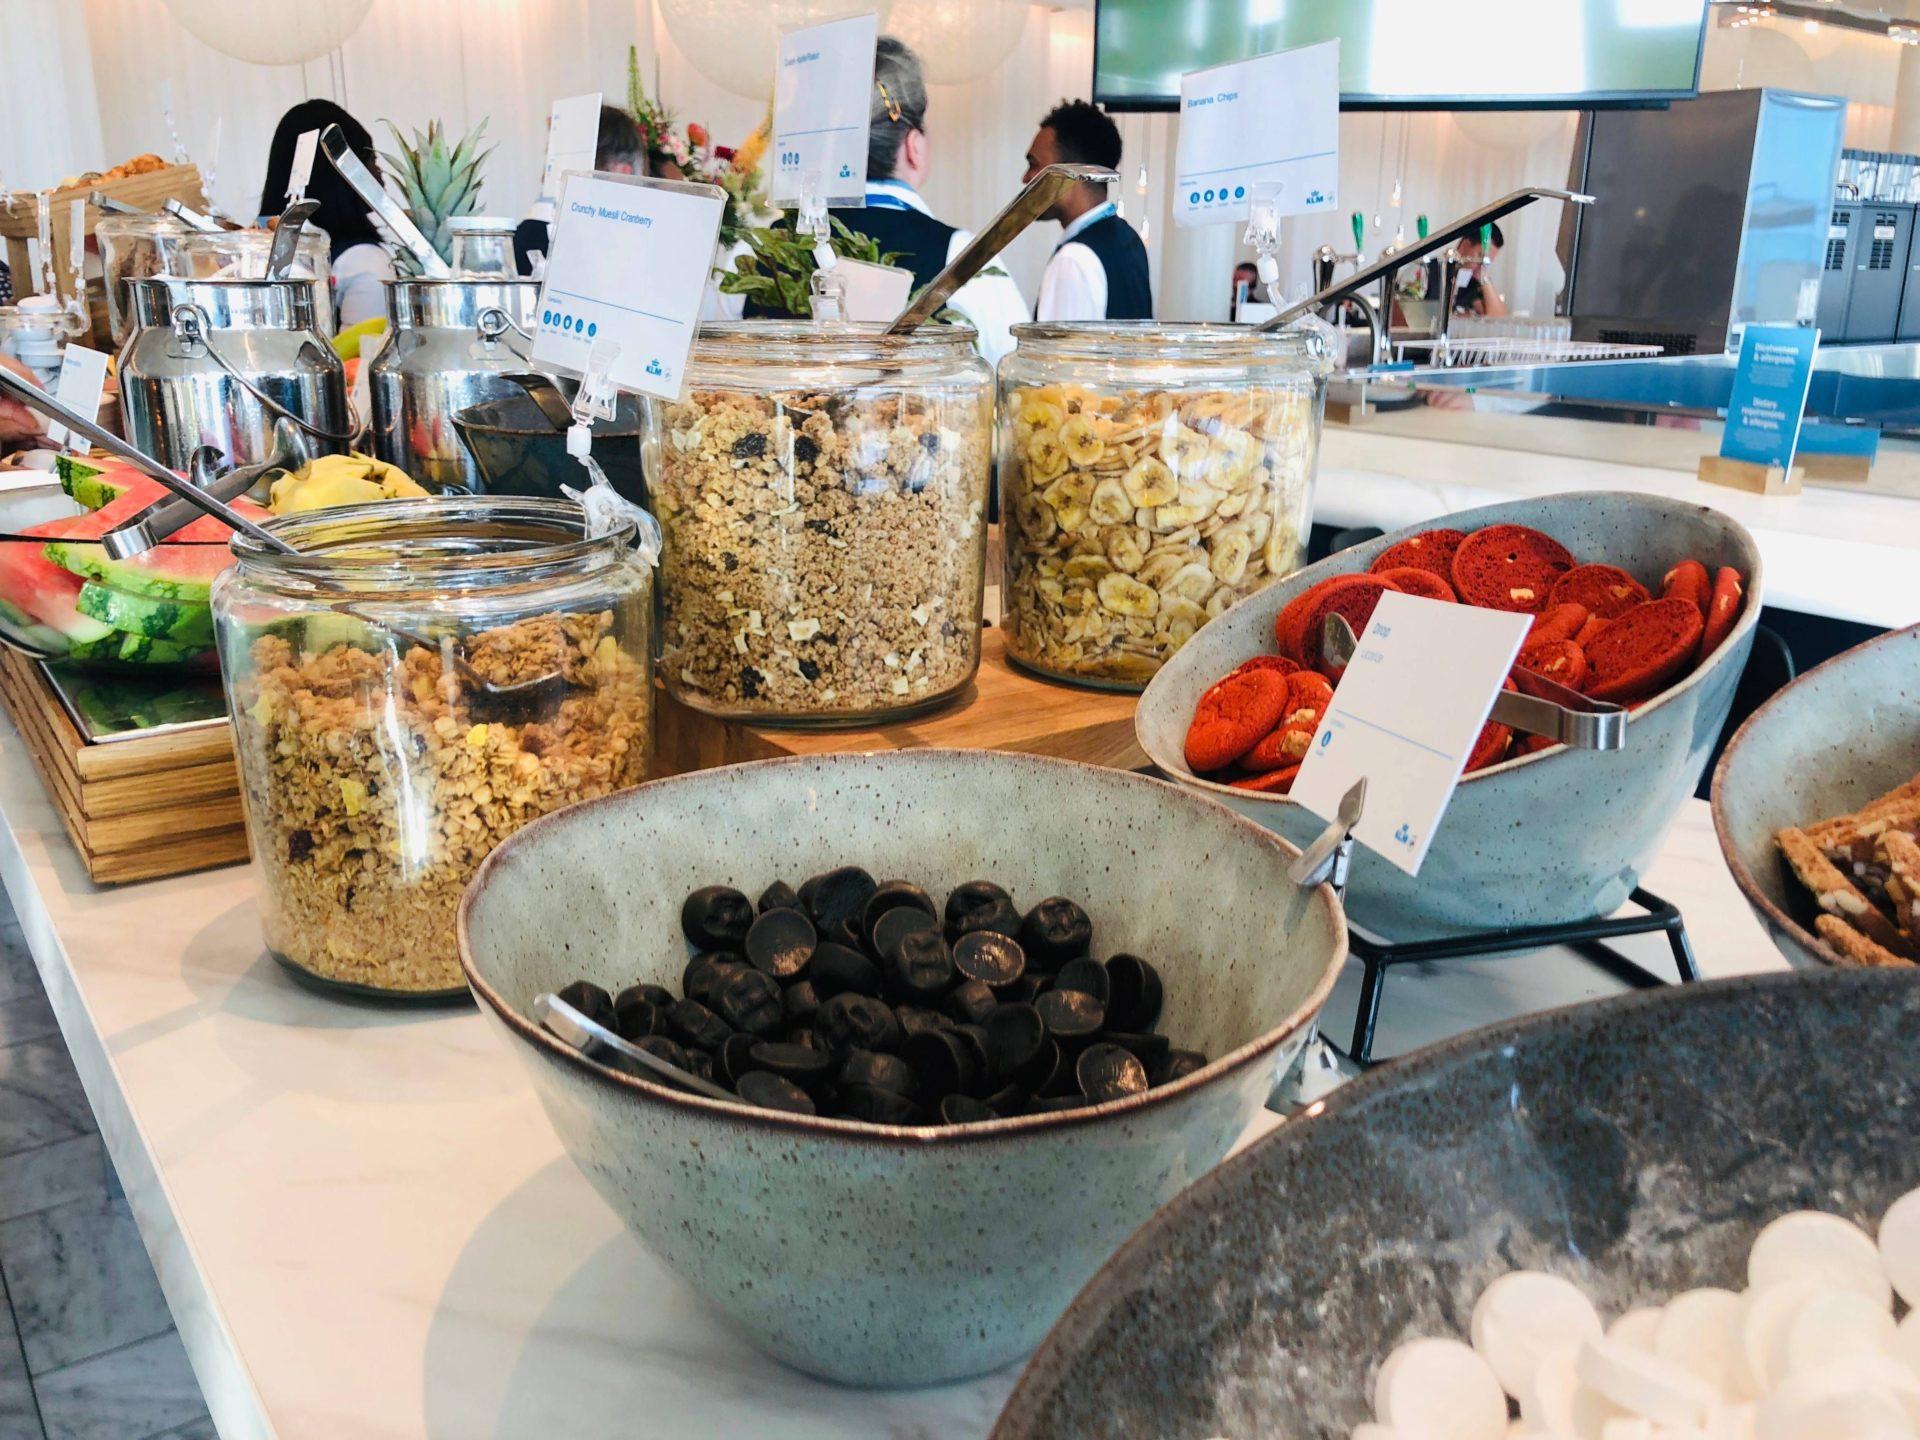 KLM Crown Lounge buffet